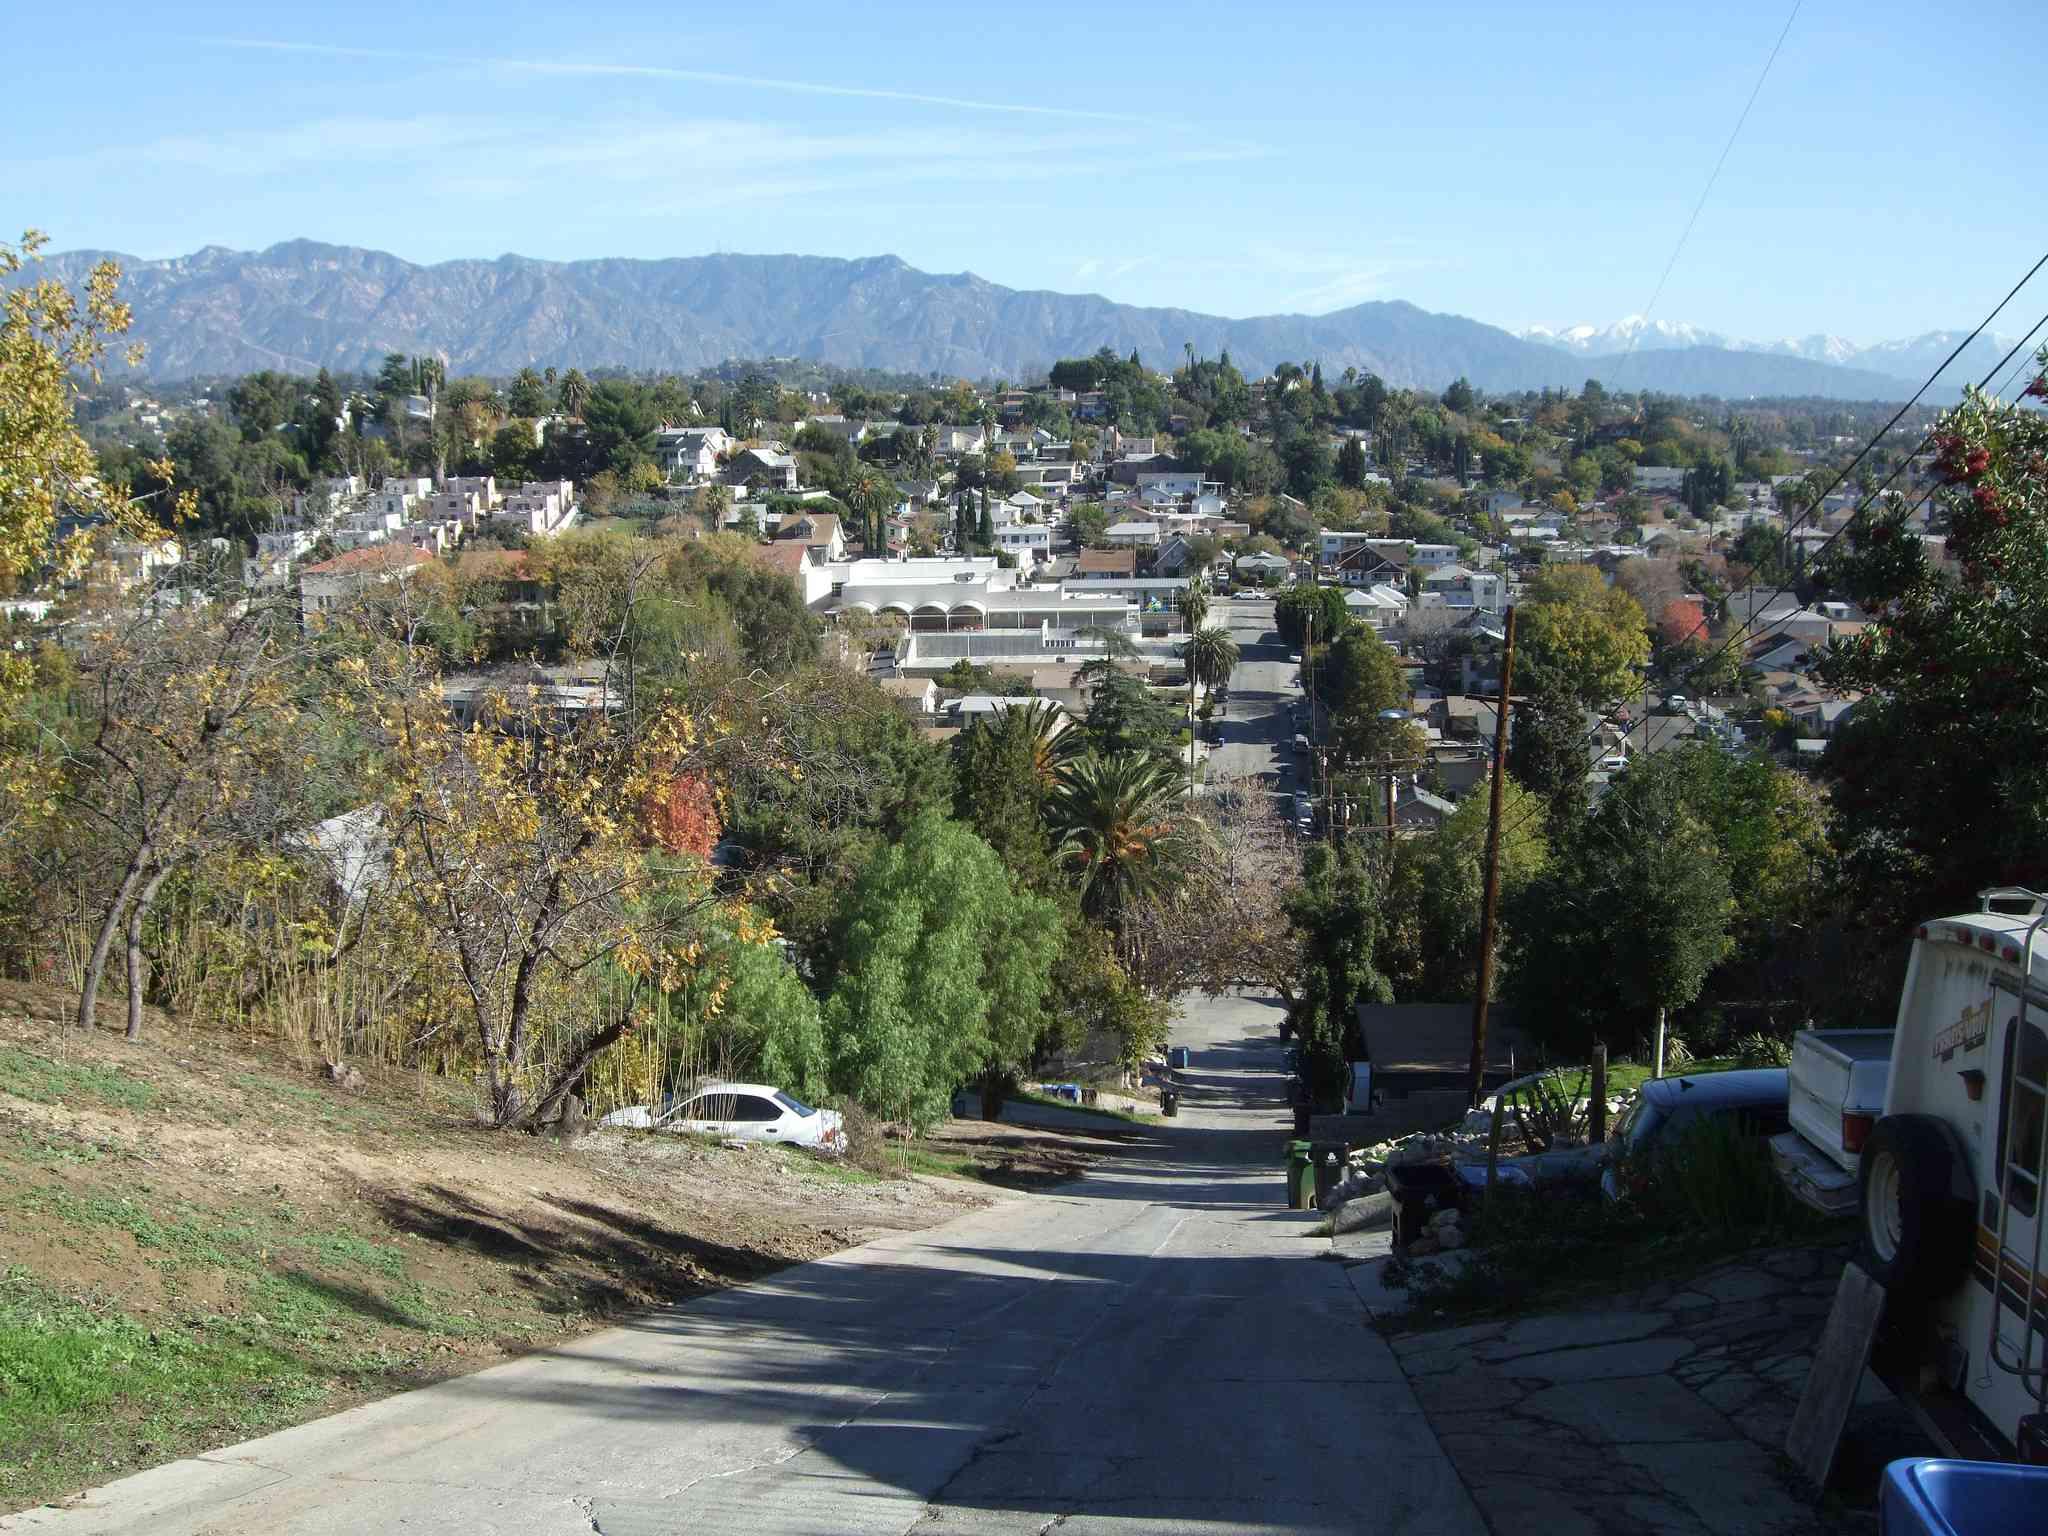 View looking down on Eldred Street, the steepest street in Los Angelos.